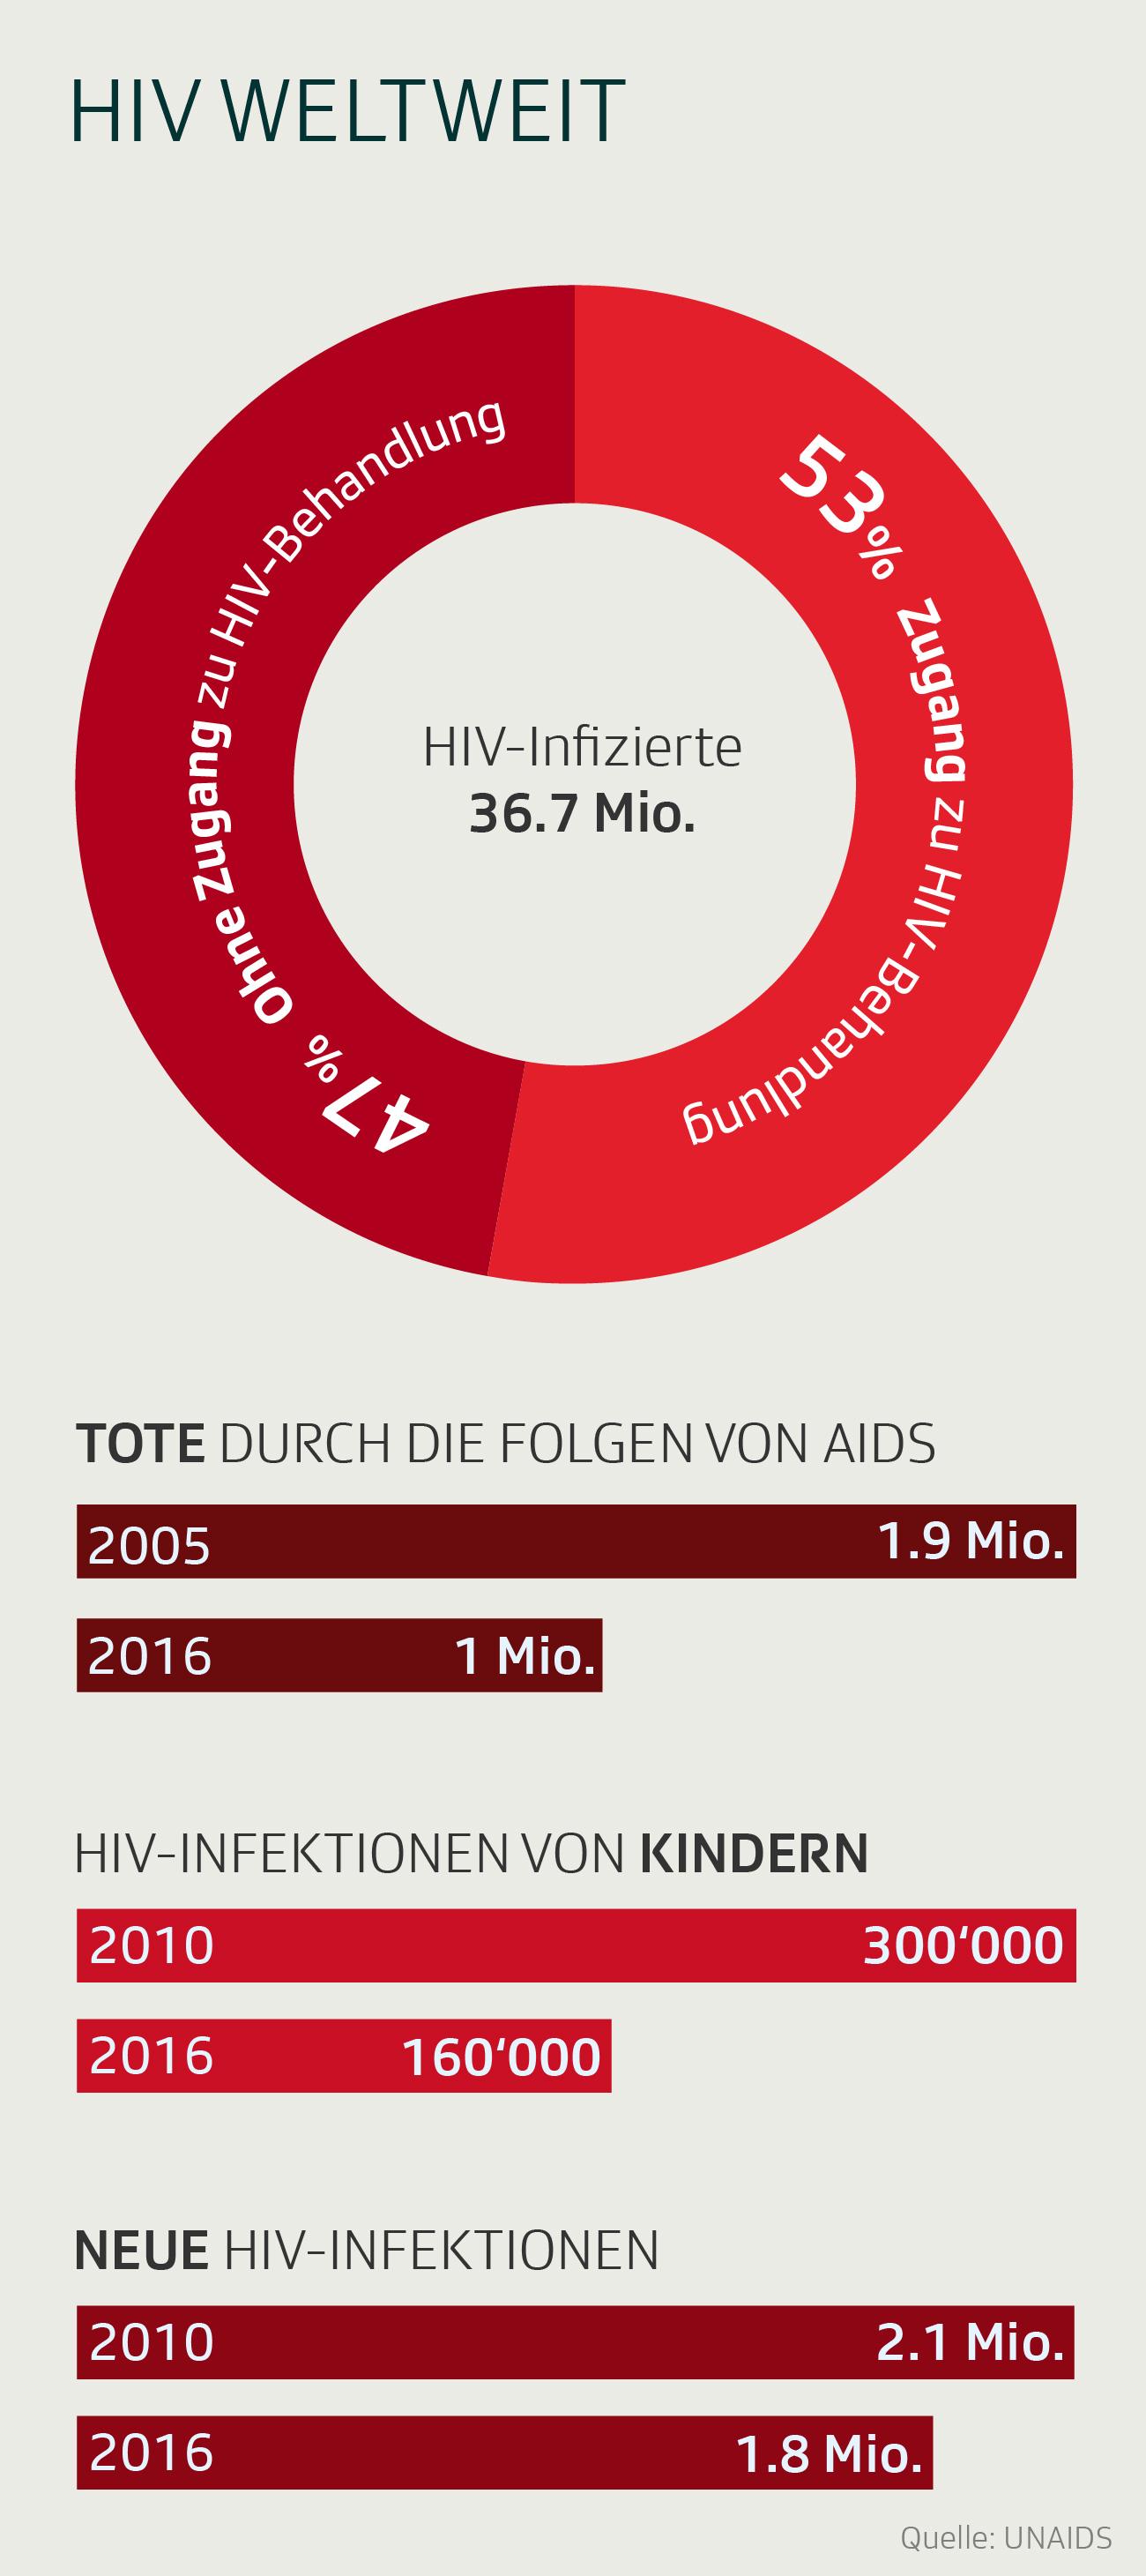 Infografik: HIV weltweit